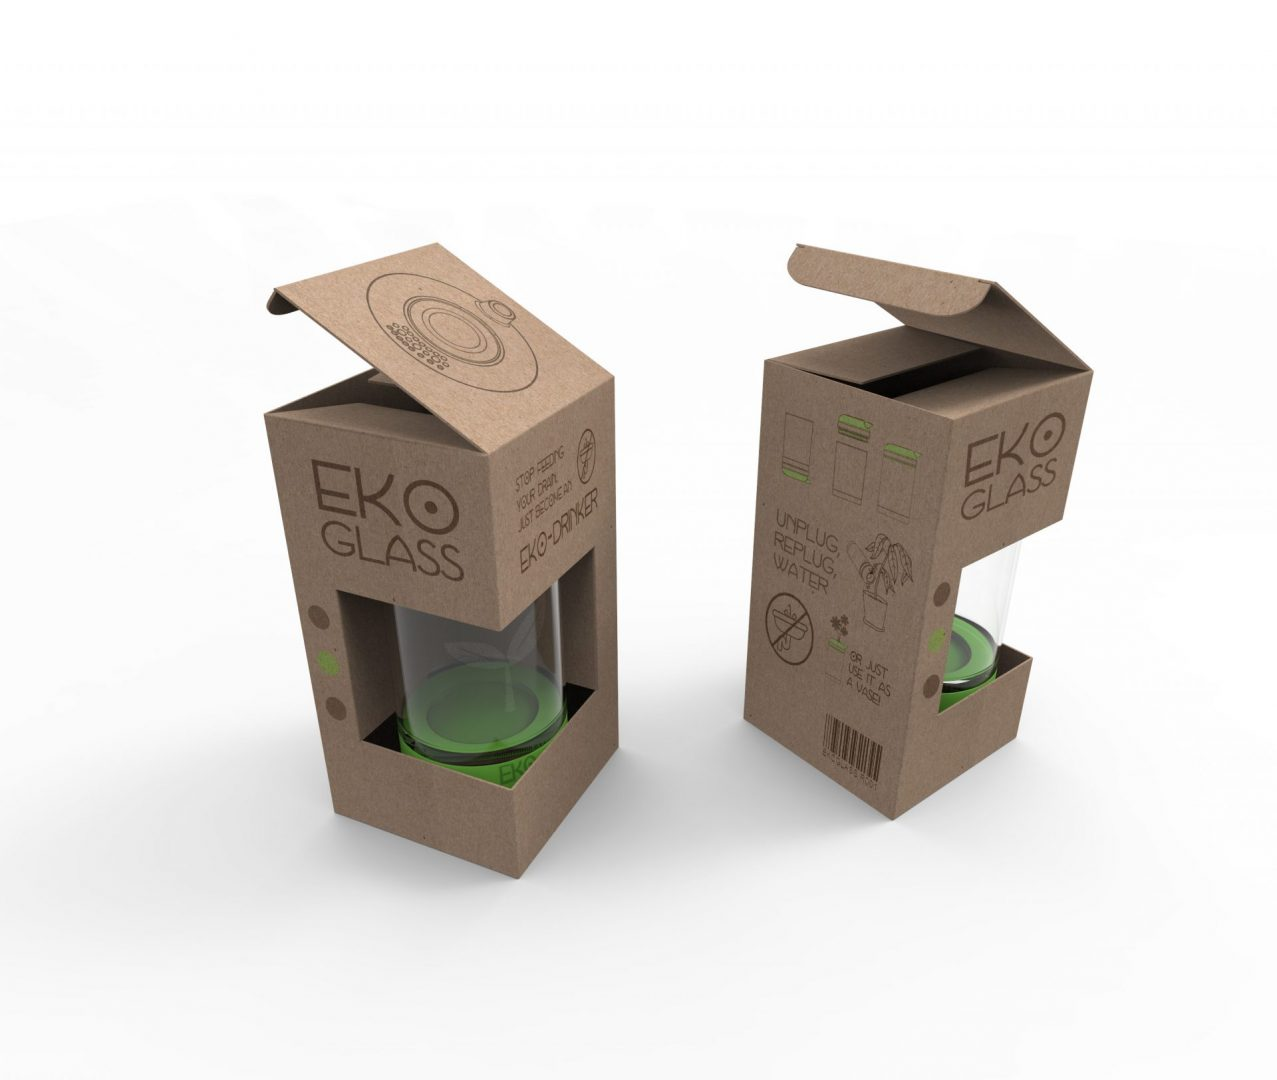 Eko Glass packaging